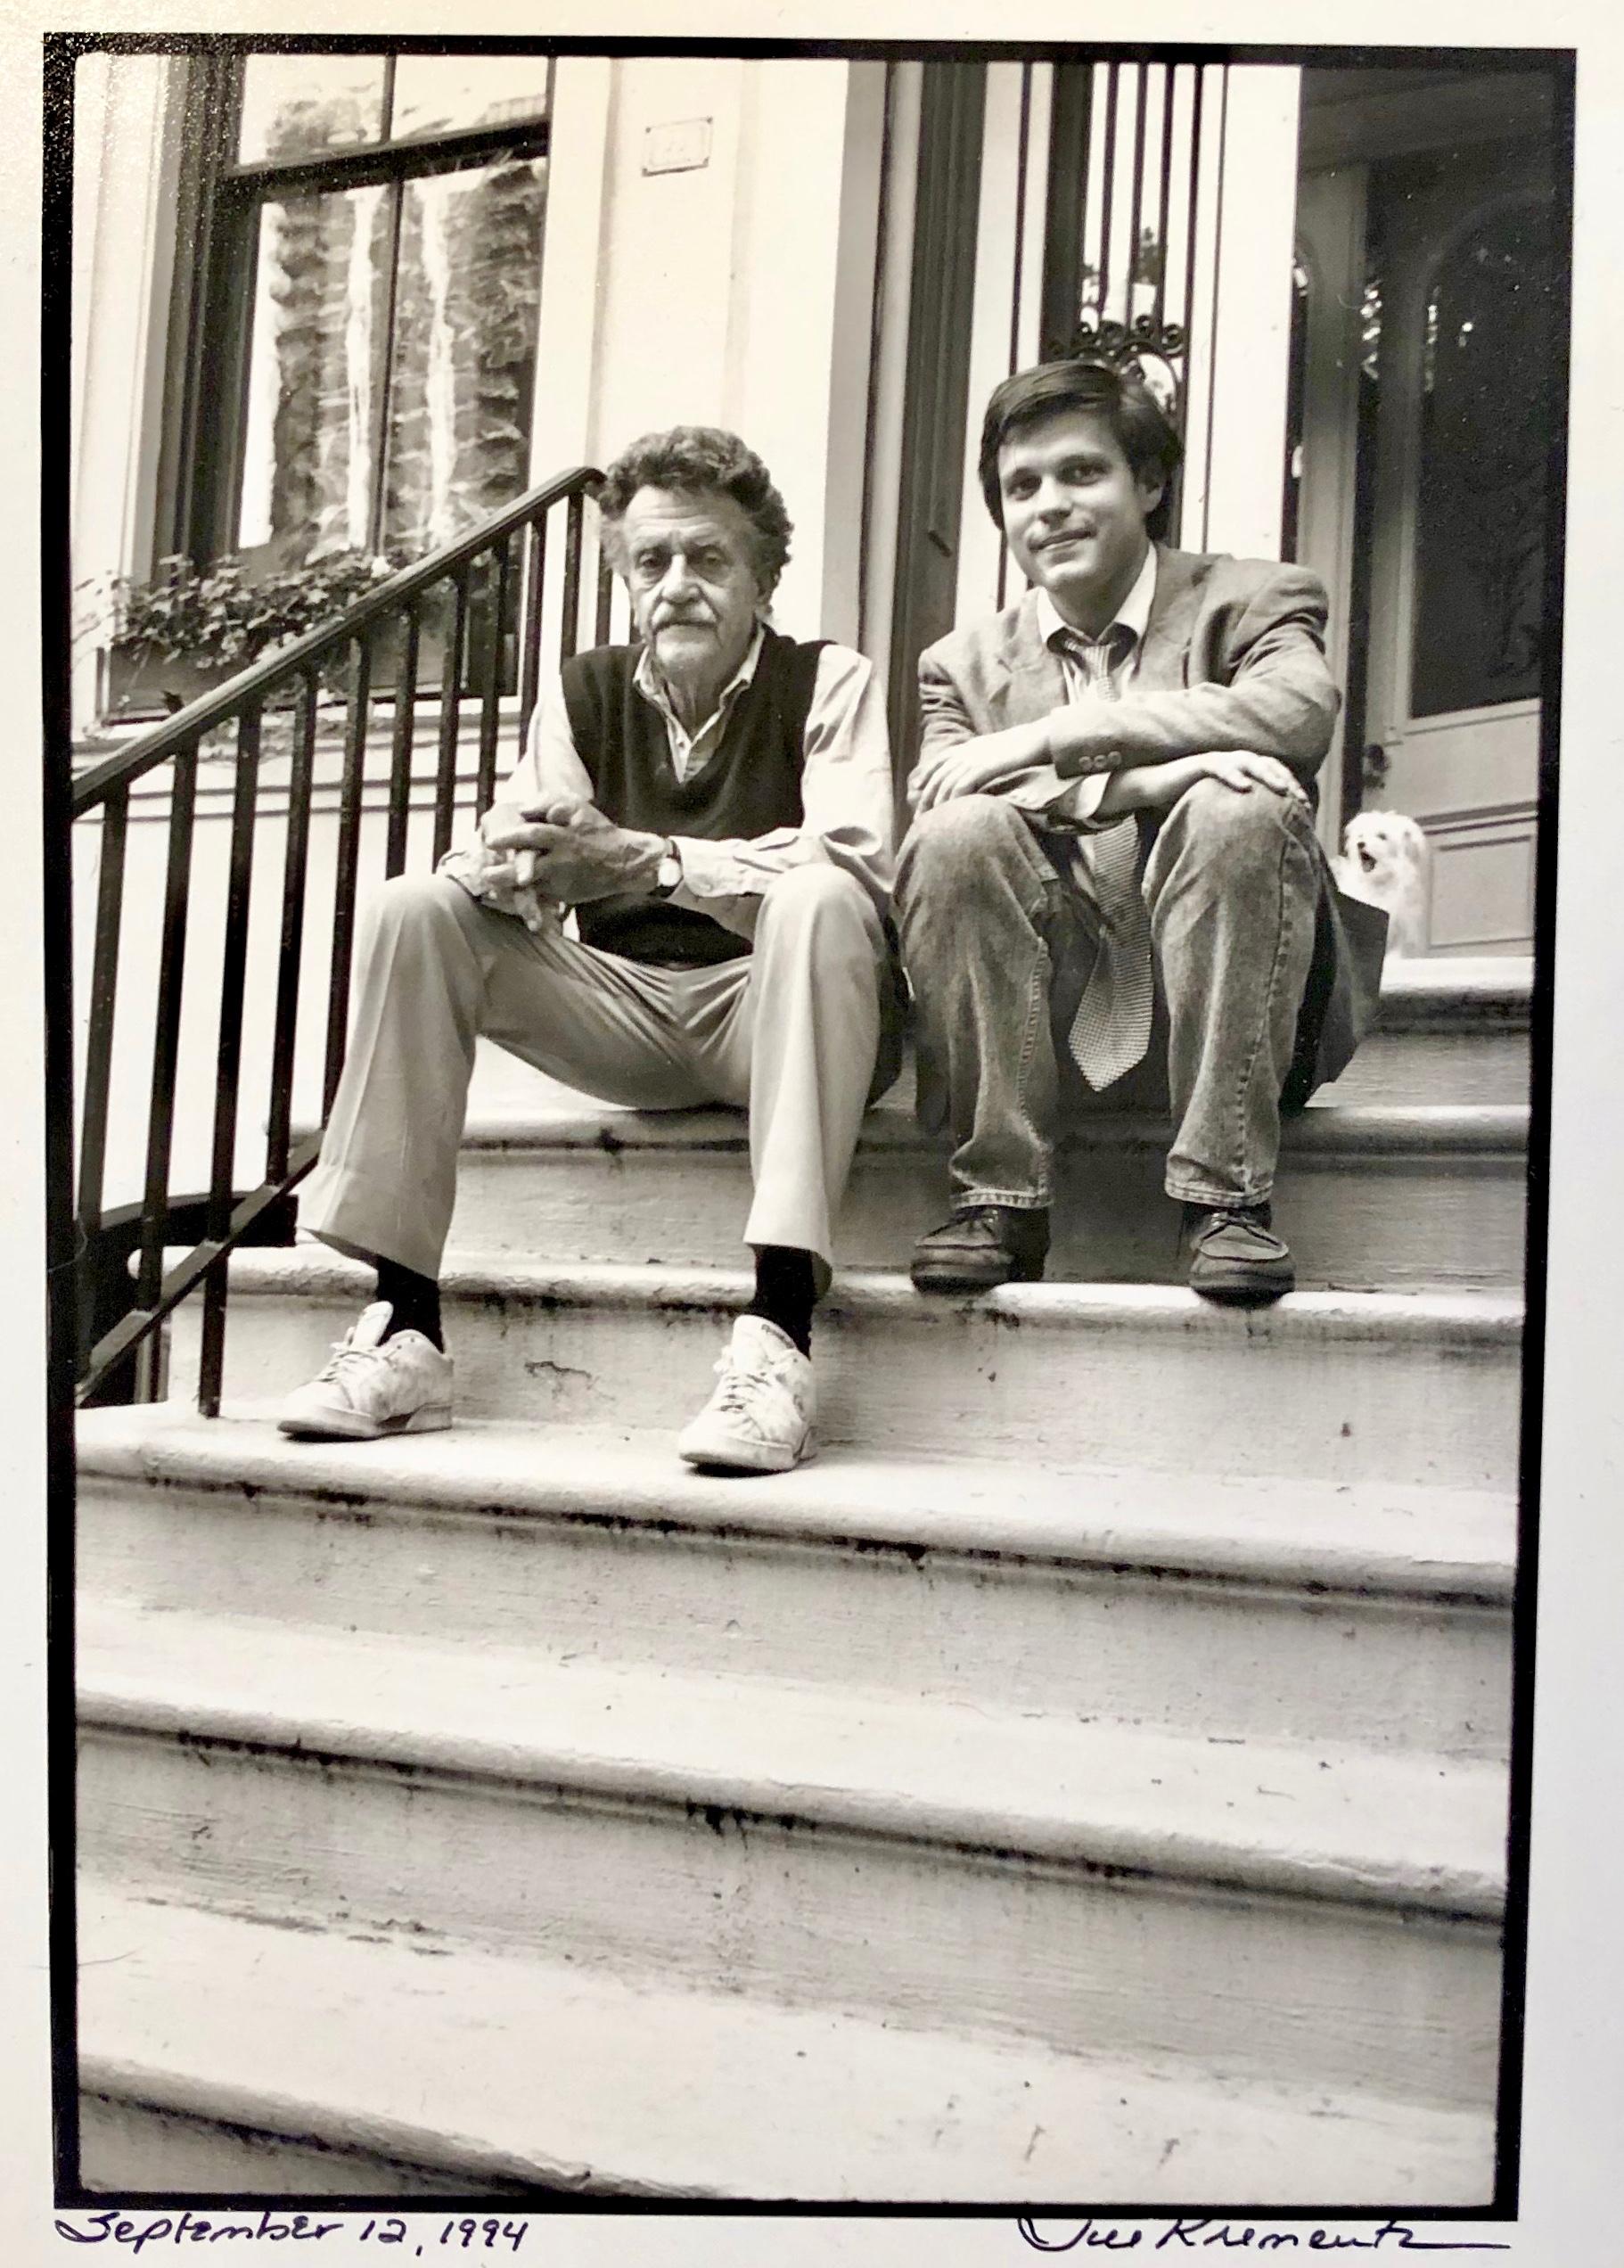 Douglas Brinkley and Kurt Vonnegut 1994